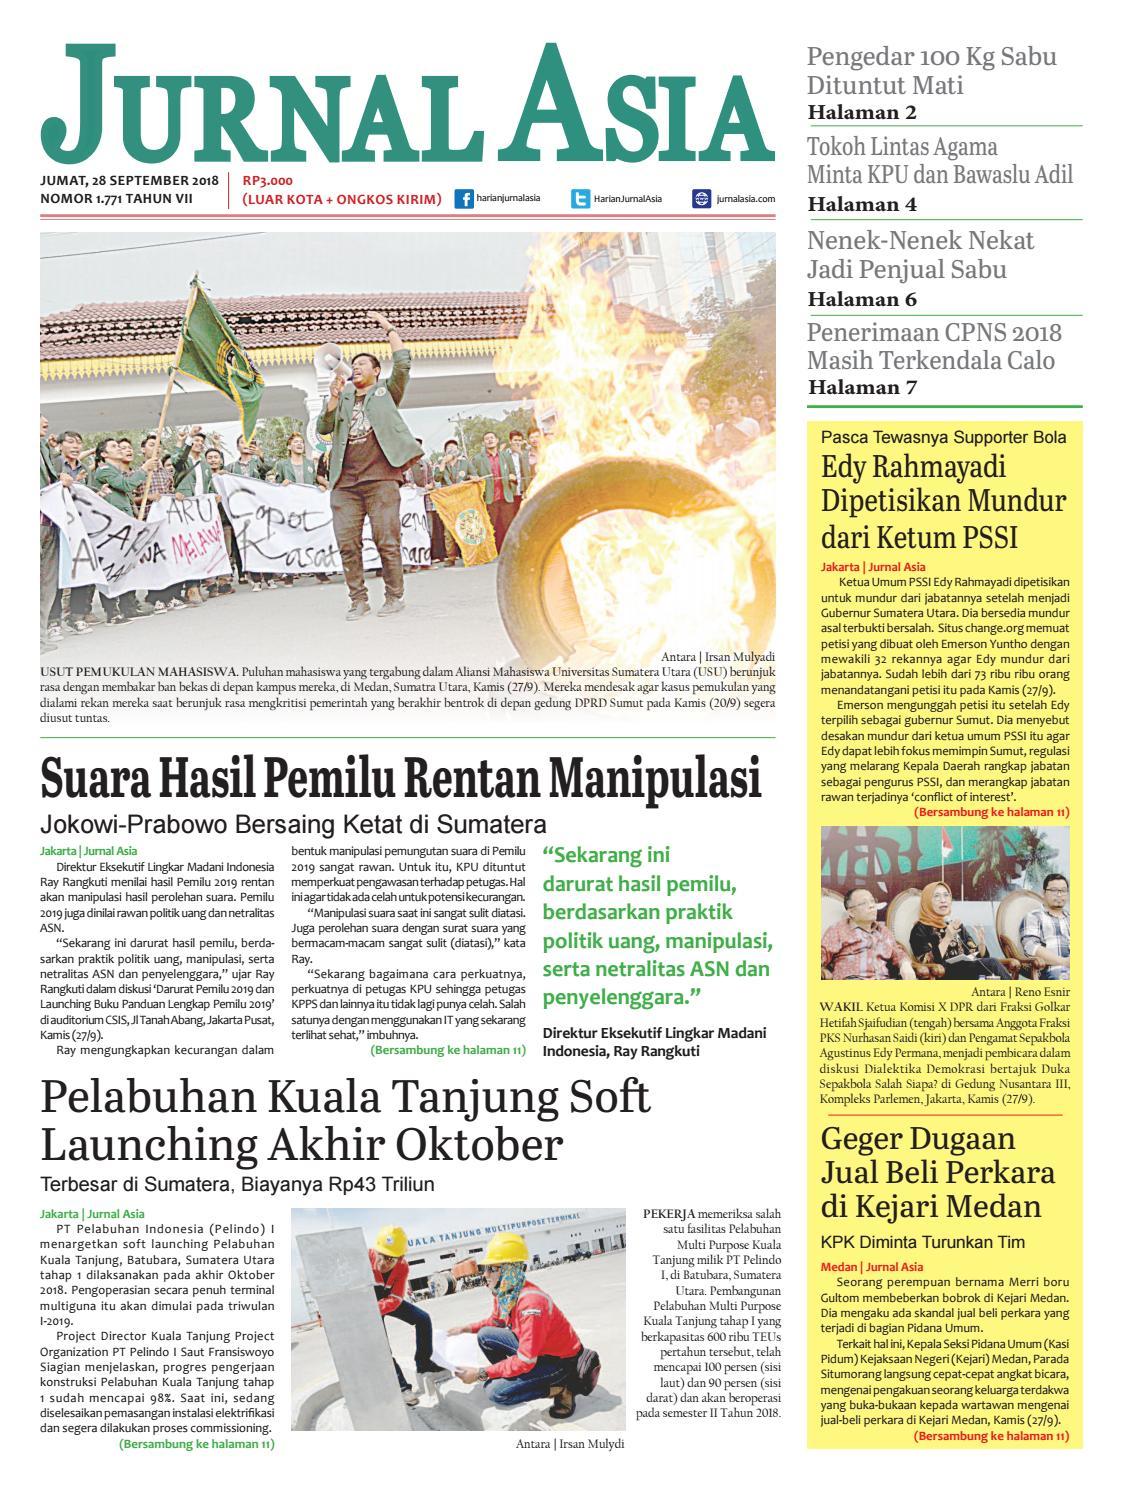 Harian Jurnal Asia Edisi Jumat a0cfd6eff3